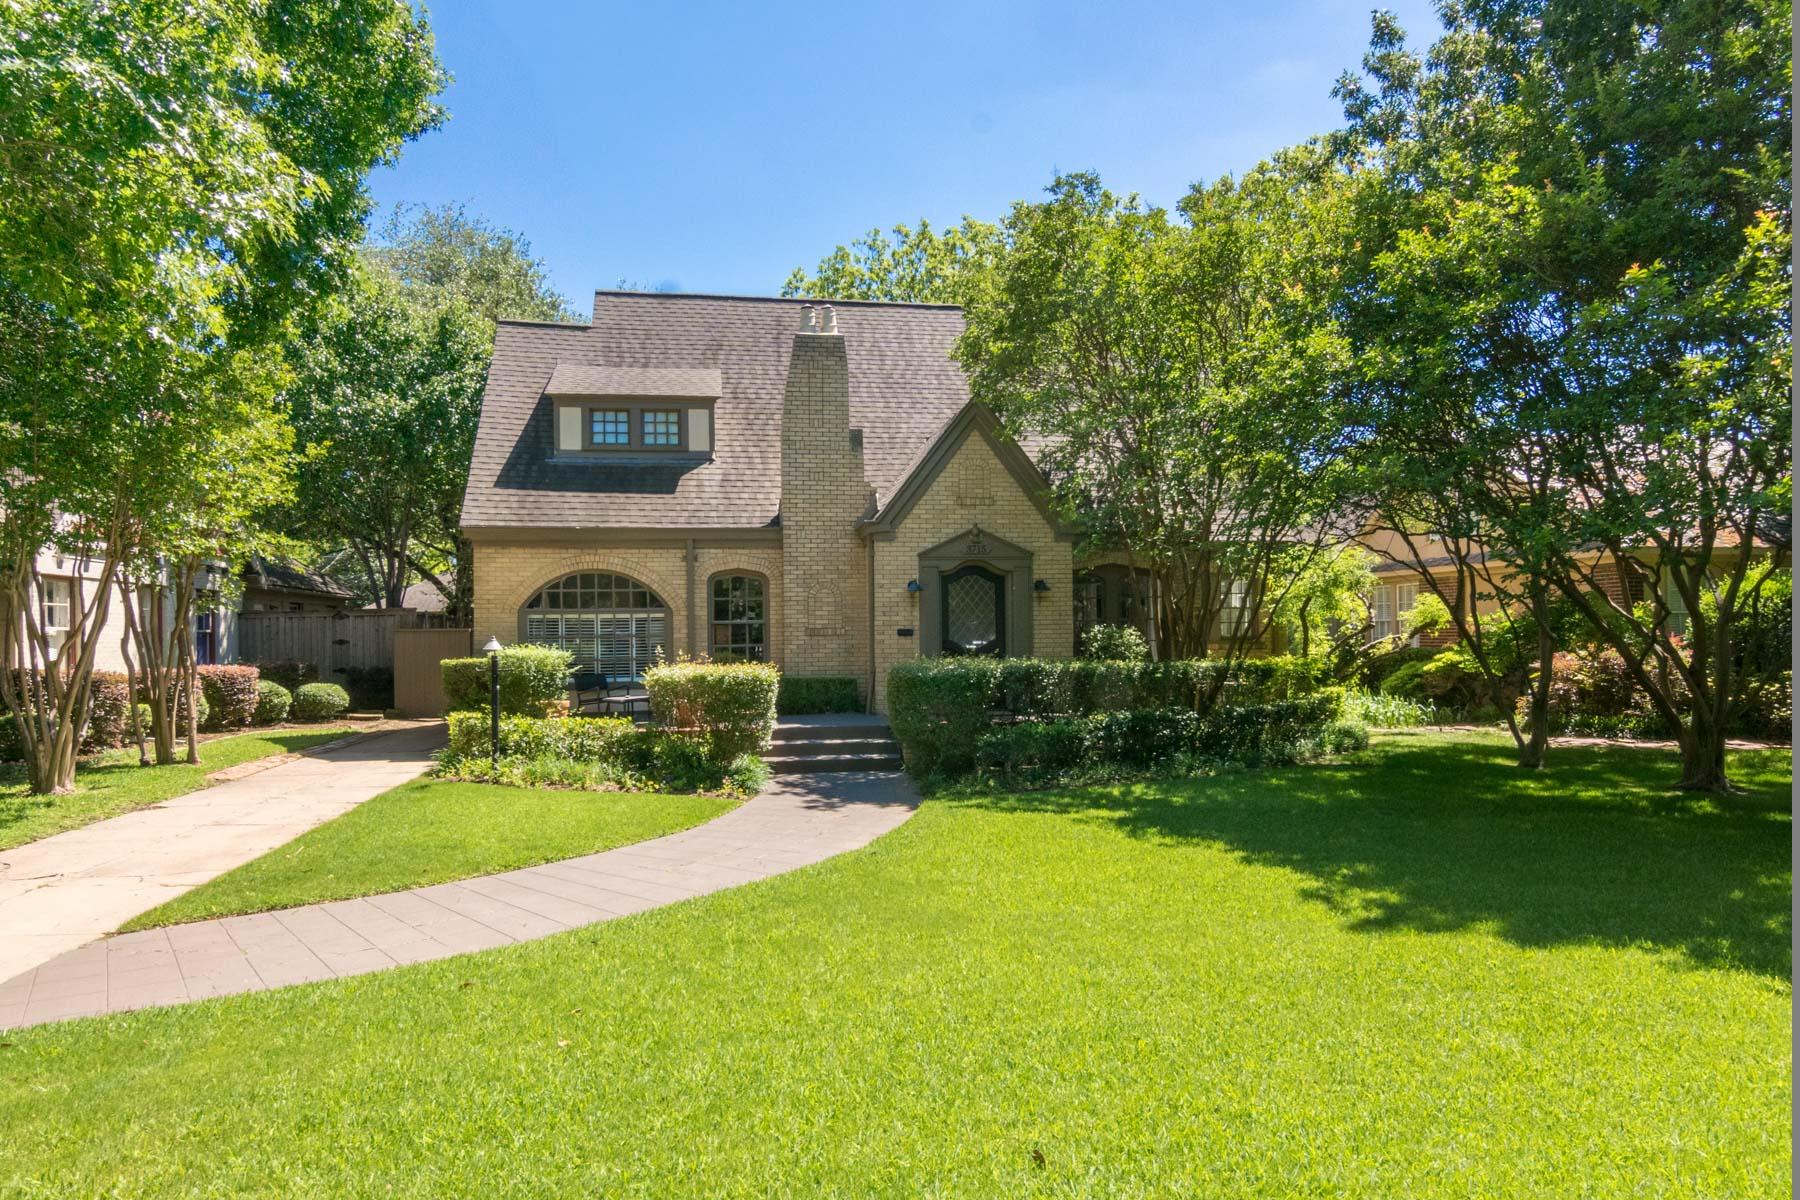 獨棟家庭住宅 為 出售 在 Highland Park Traditional 3715 Mockingbird Lane Dallas, 德克薩斯州, 75205 美國